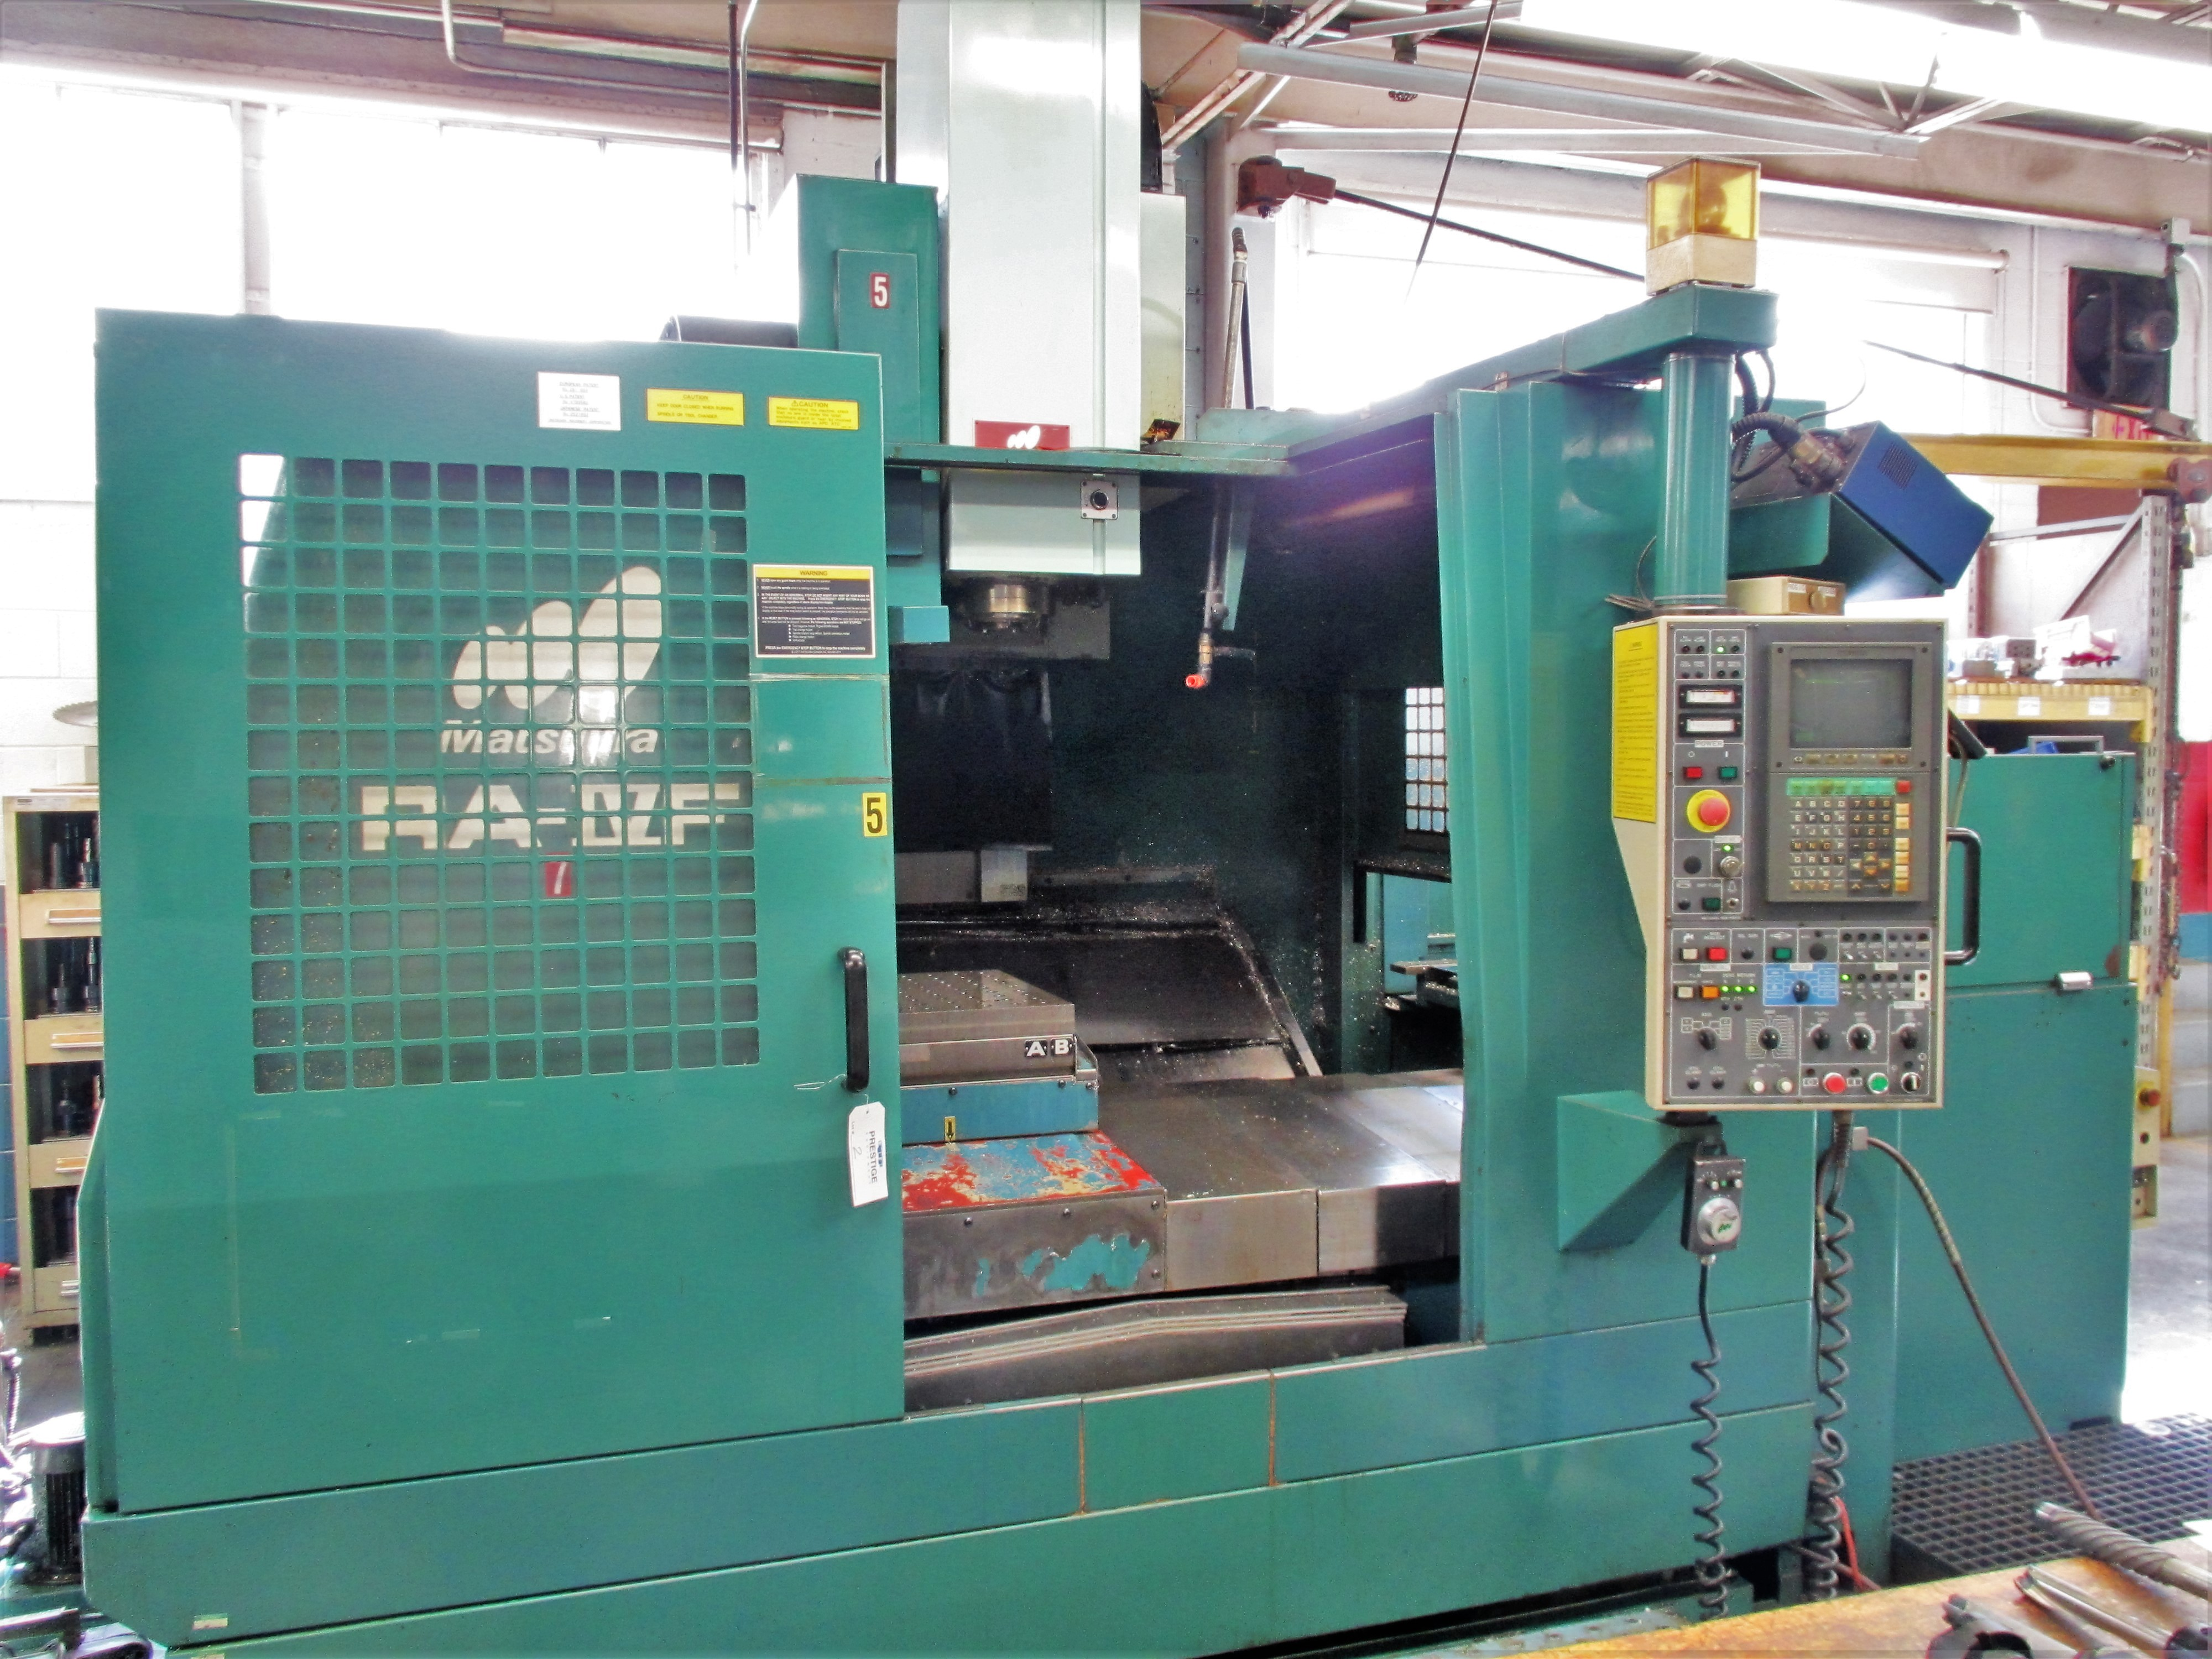 MATSUURA RA-4F CNC VERTICAL MACHINING CENTER WITH APC